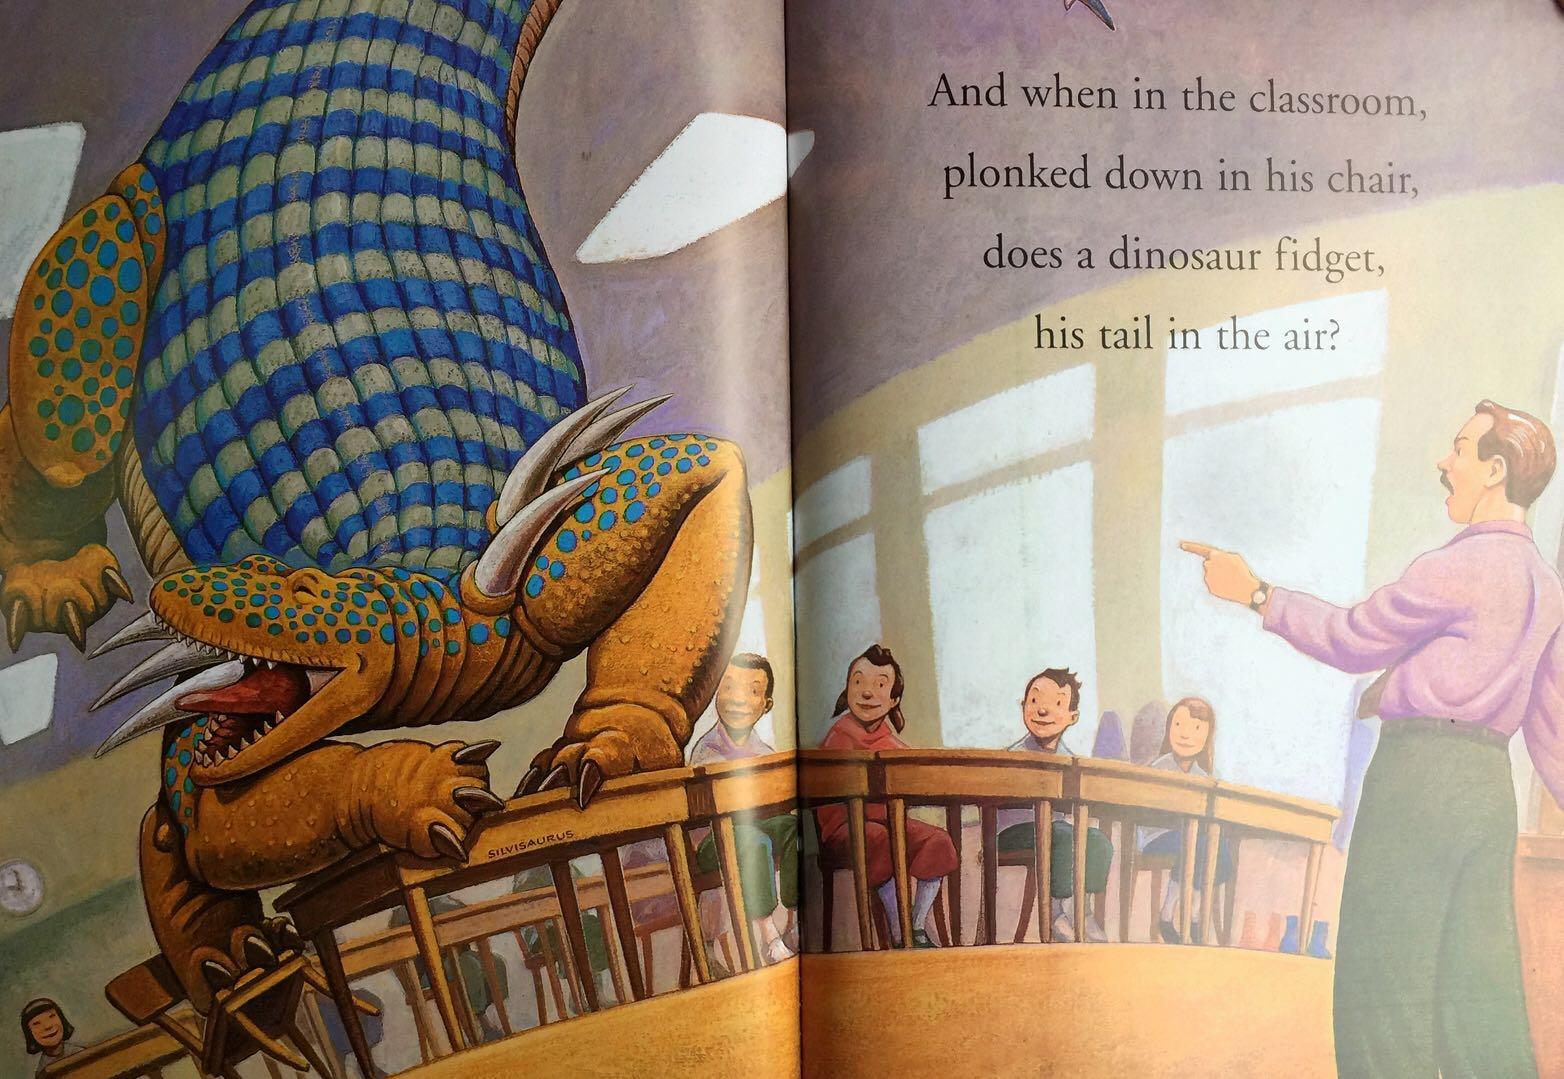 How Do Dinosaurs 6 Books Picture English Books For Kids Educational Toys Children Learning Story Books Kindergarten Reading Book